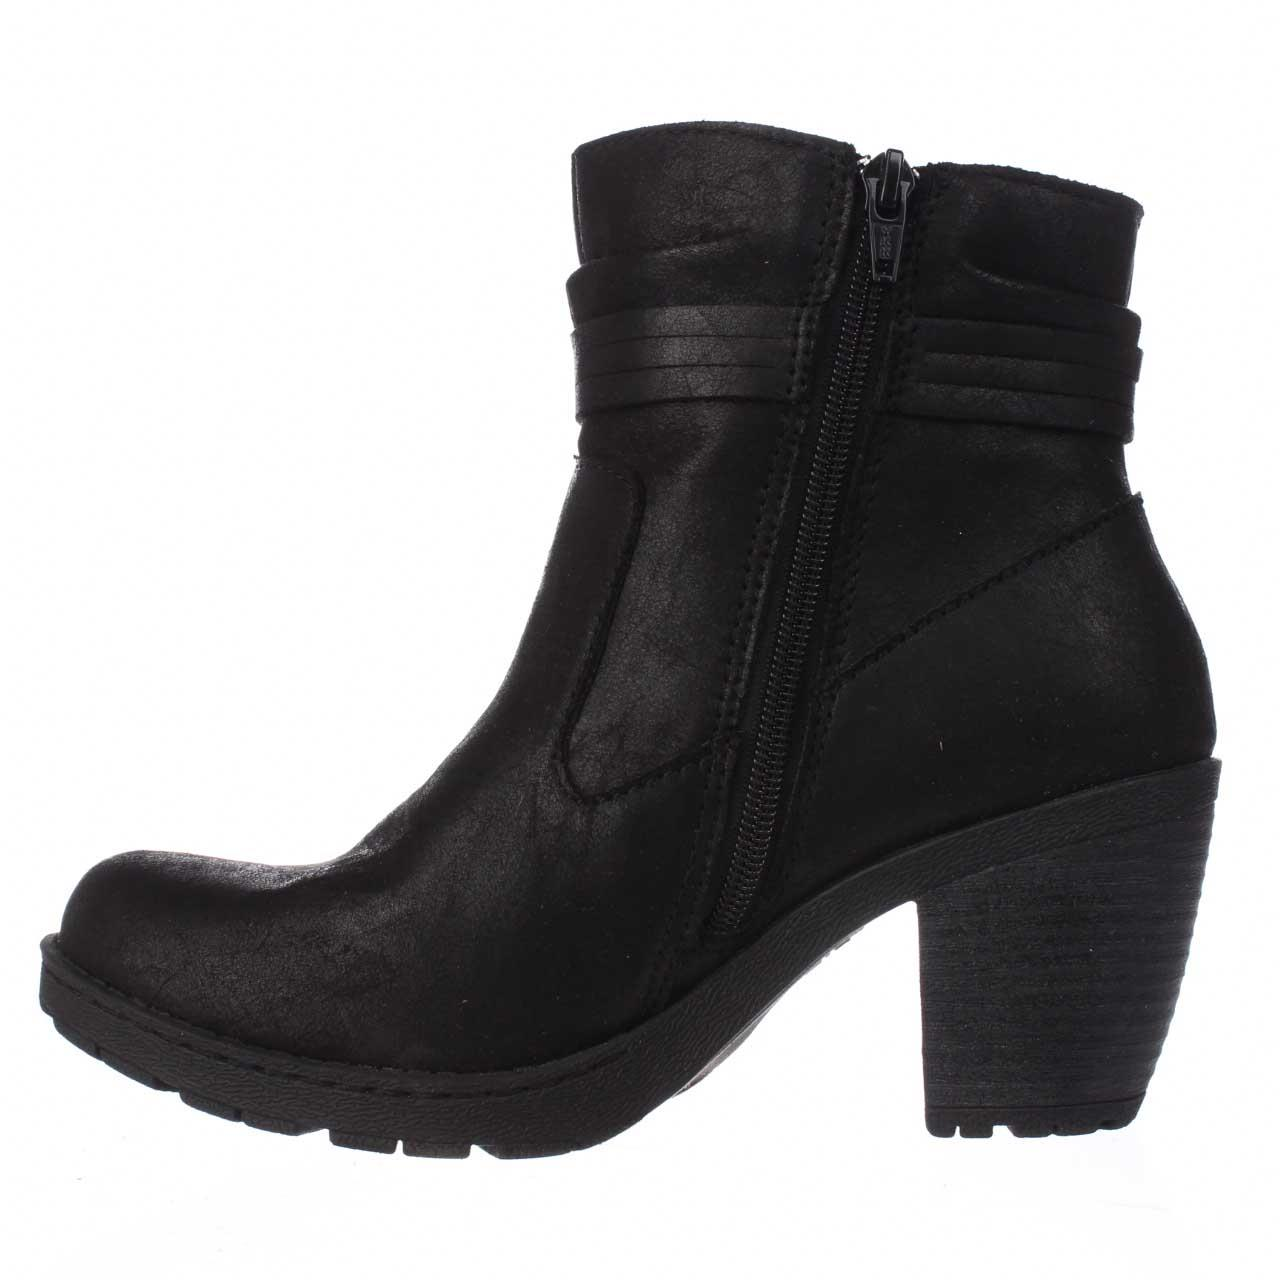 Womens Sole Born Alicudi Tassel Lug Sole Womens Ankle Boots - Black c142bd